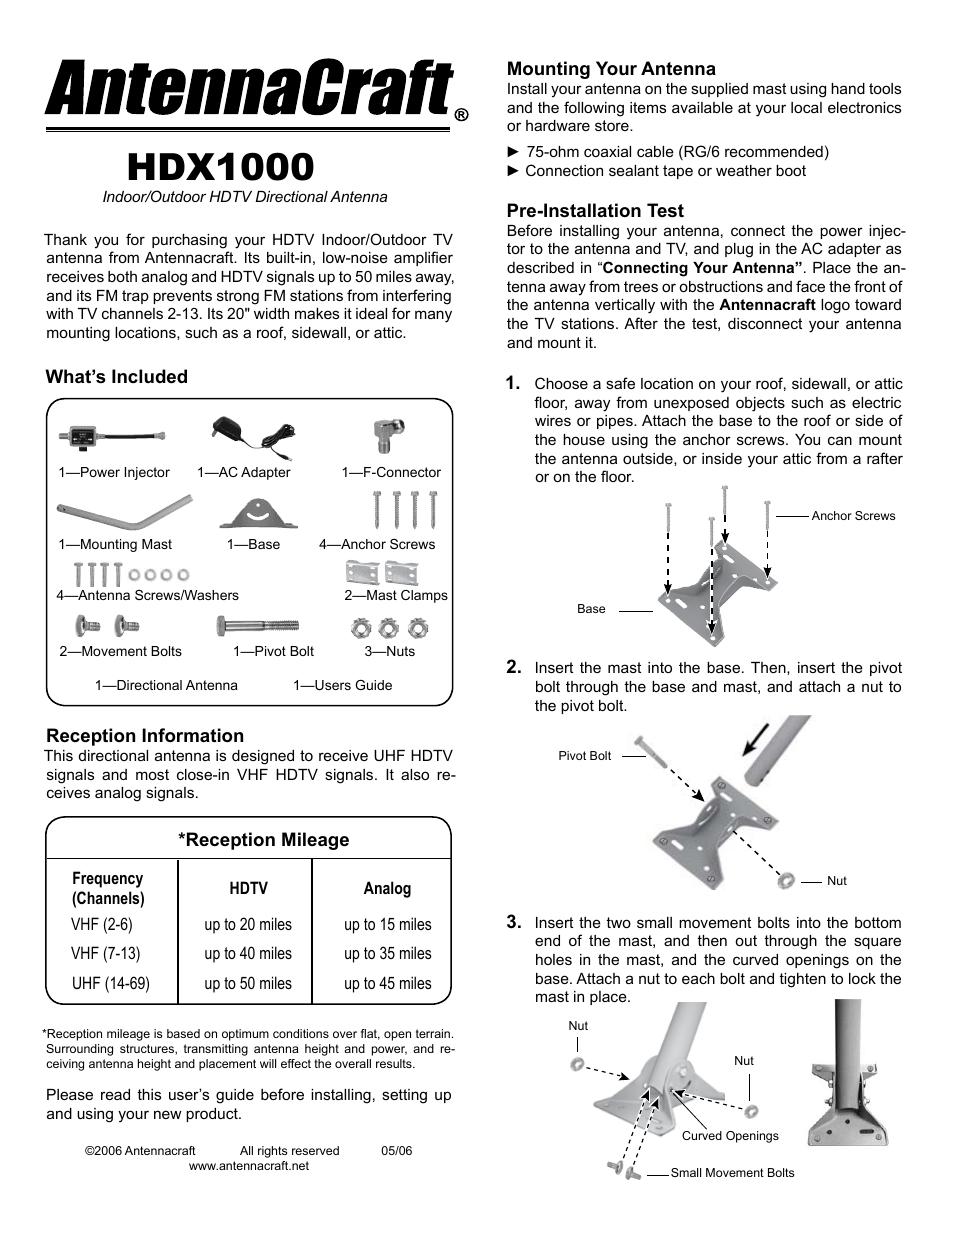 Antennacraft Hdx1000 User Manual 4 Pages Antenna Wiring House